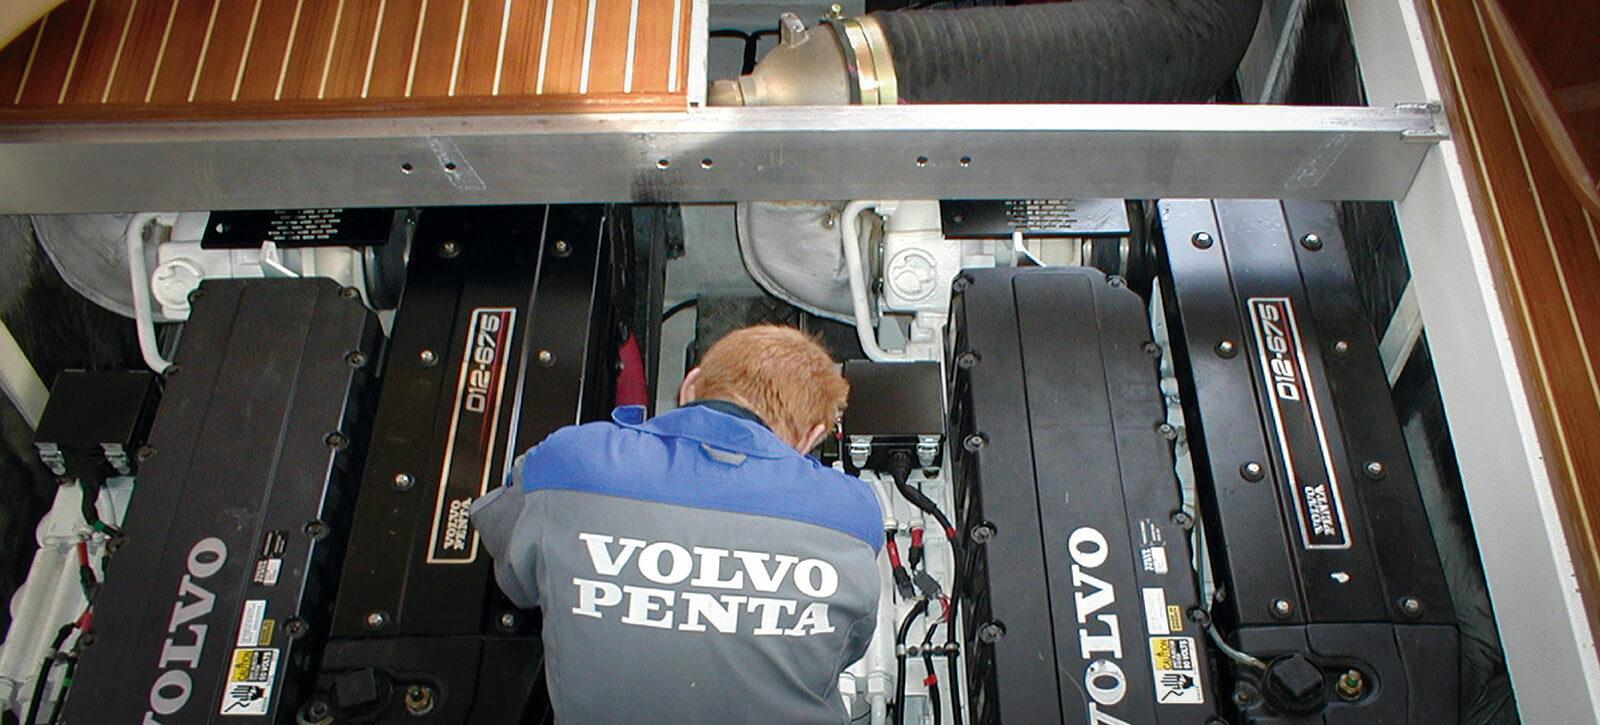 Volvo Penta marine engine servicing | Qualified Volvo Penta